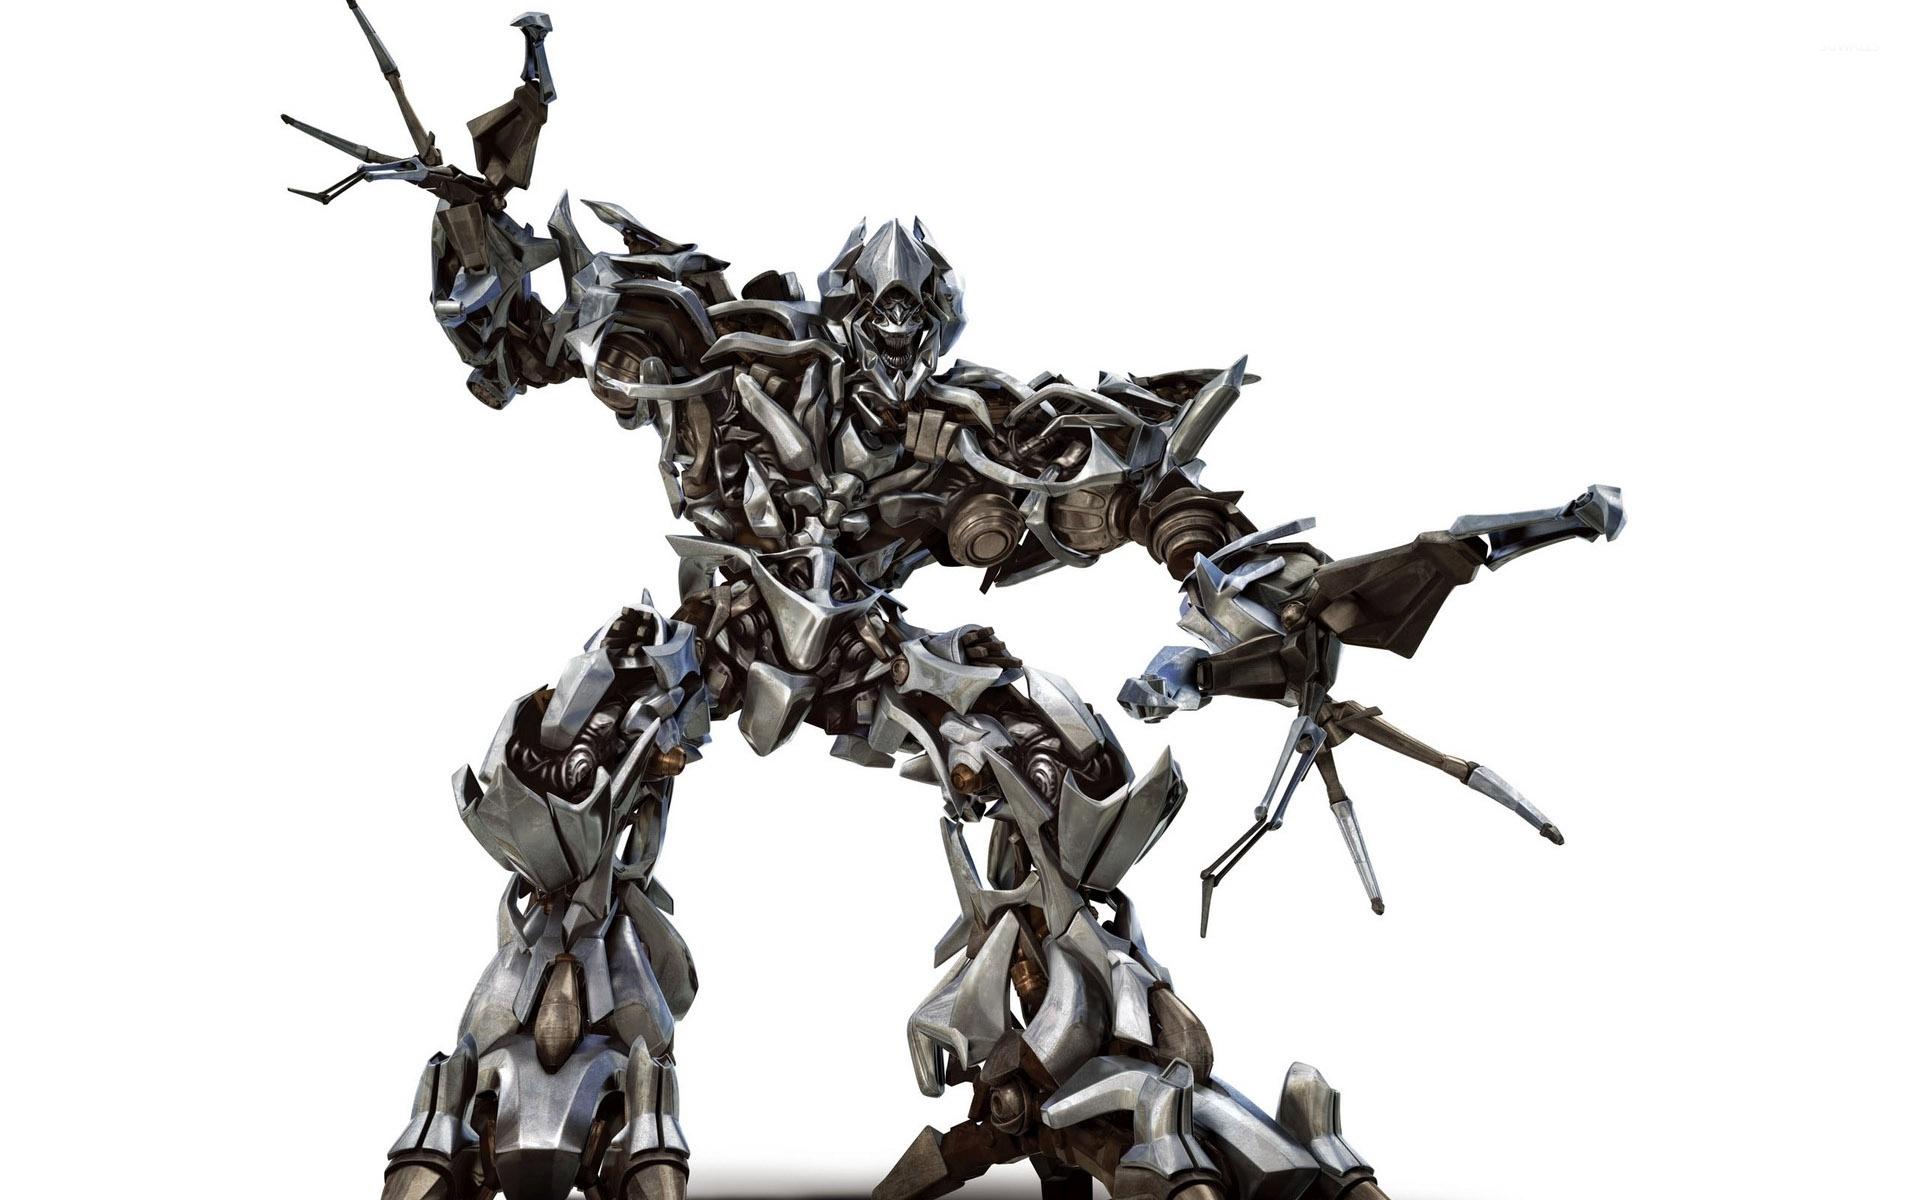 Megatron Transformers [4] Wallpaper Movie Wallpapers